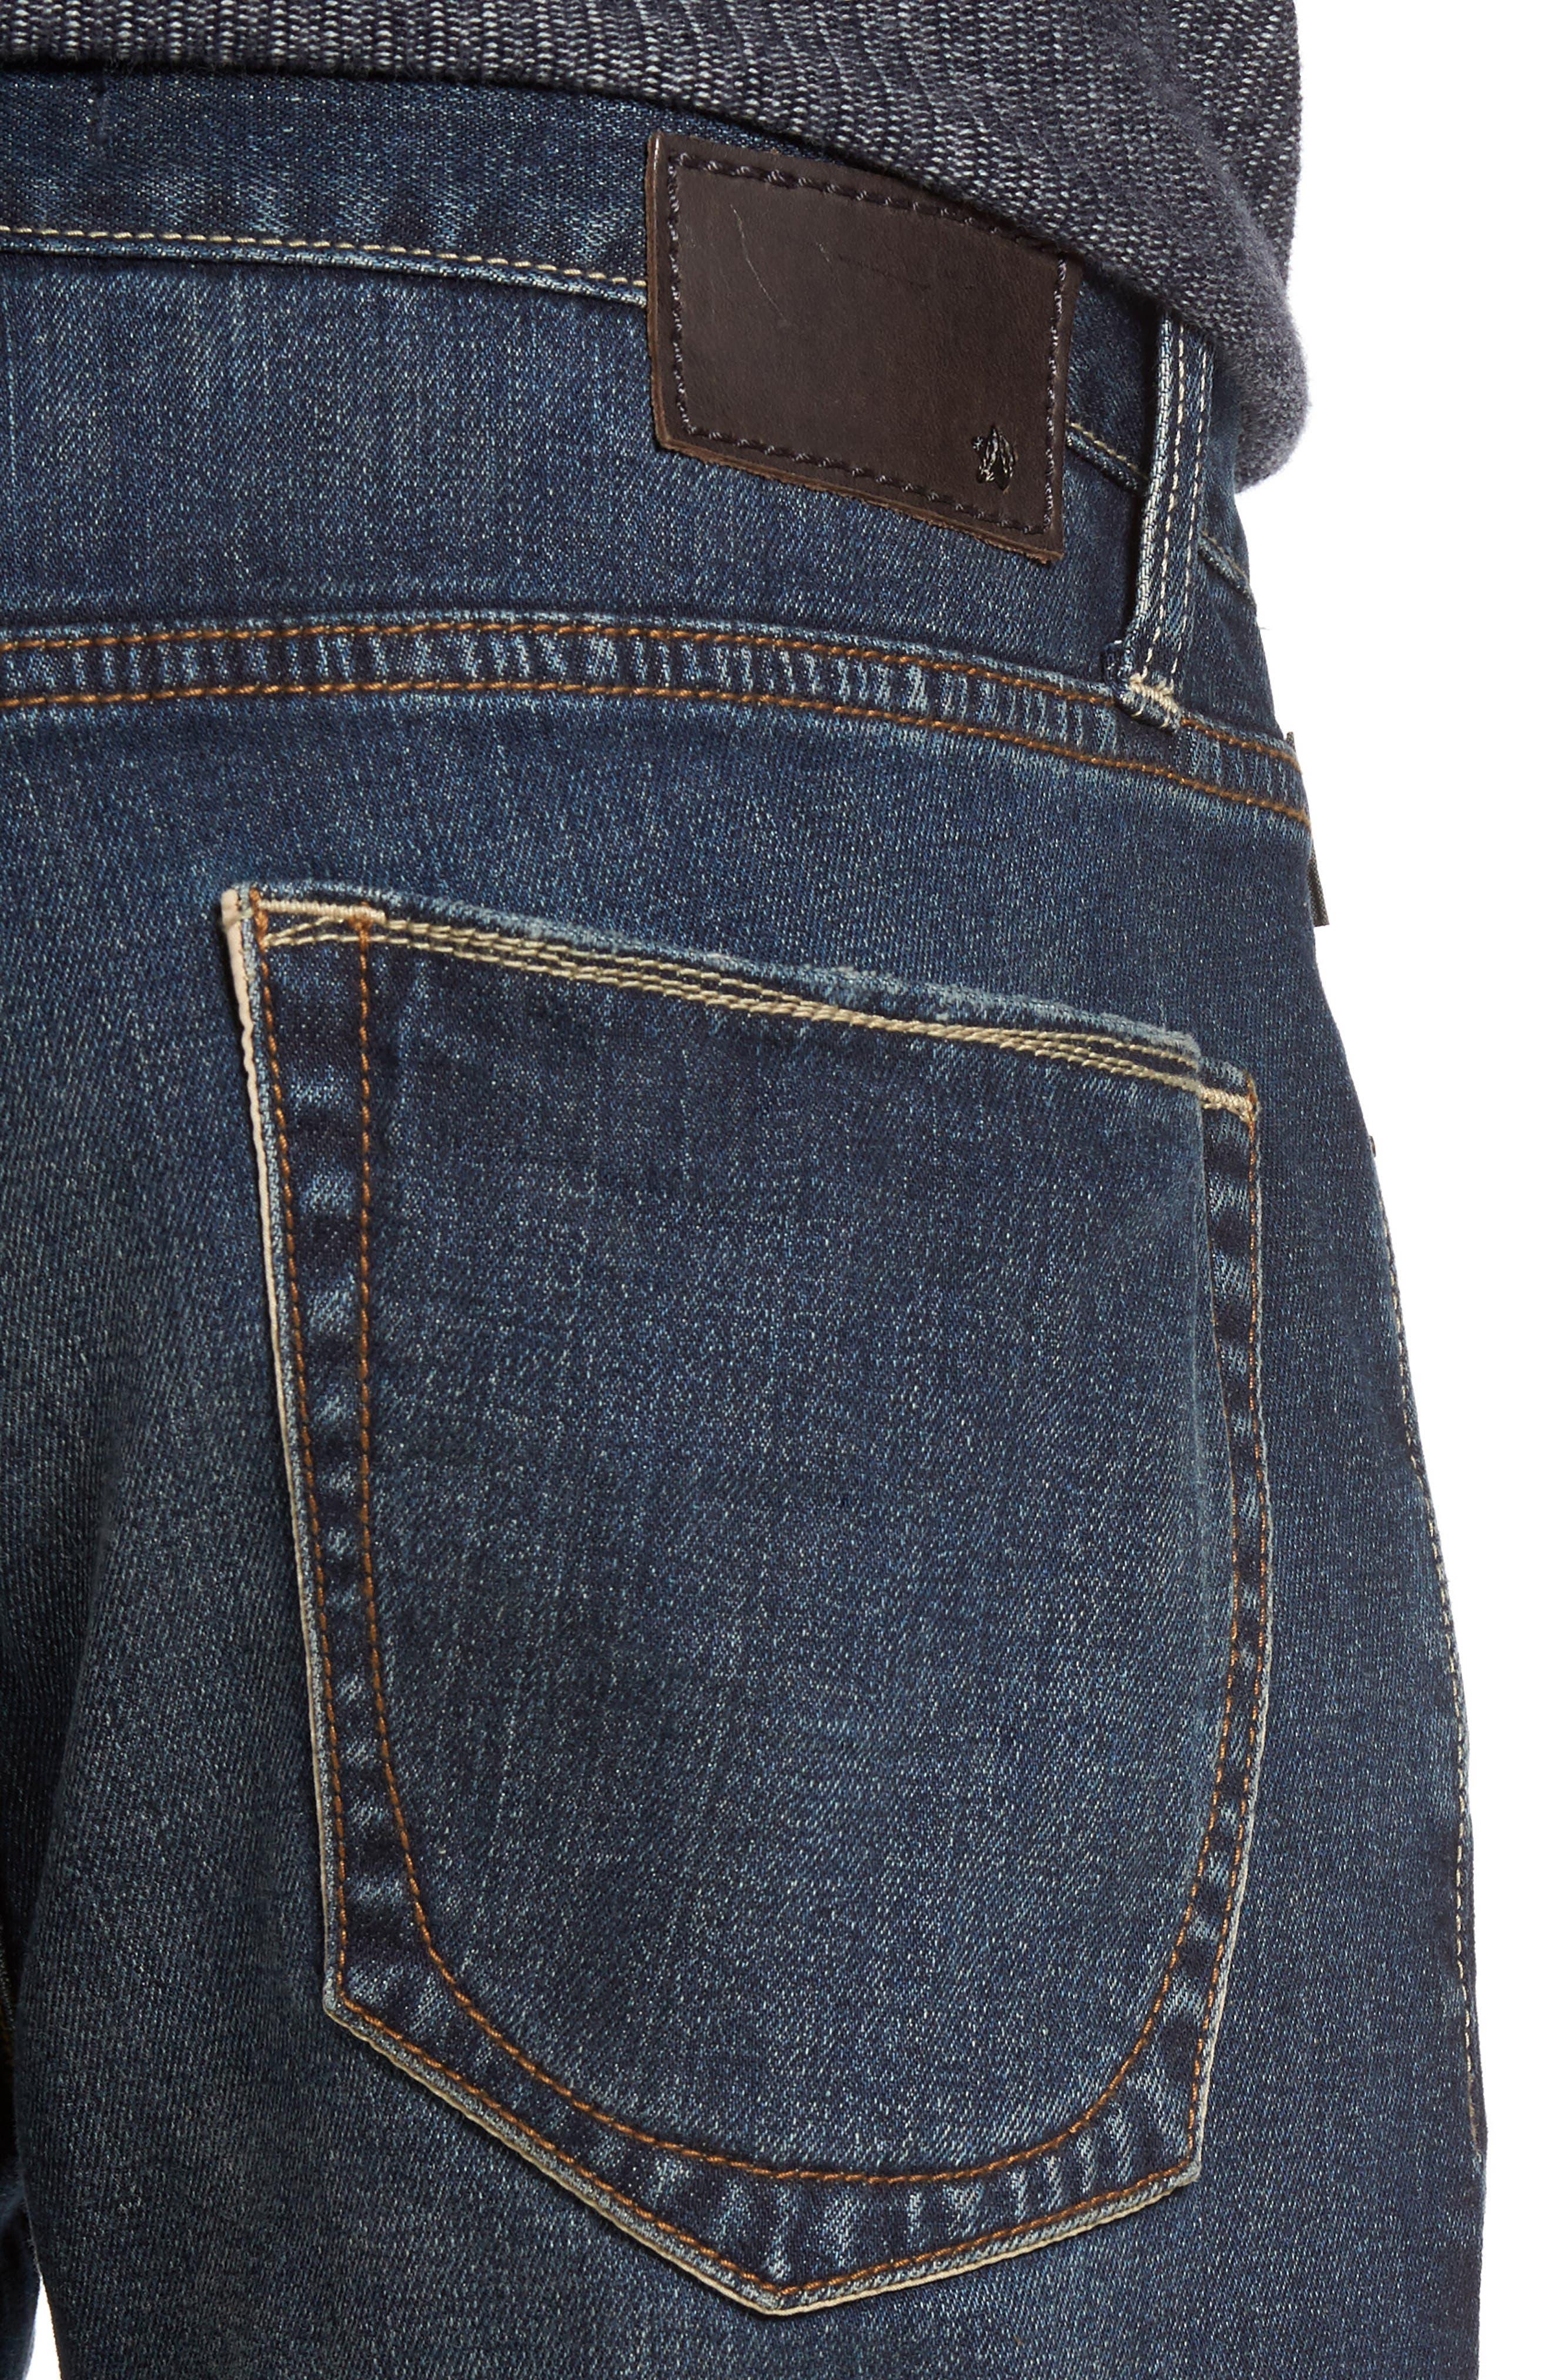 Bowery Slim Straight Leg Jeans,                             Alternate thumbnail 10, color,